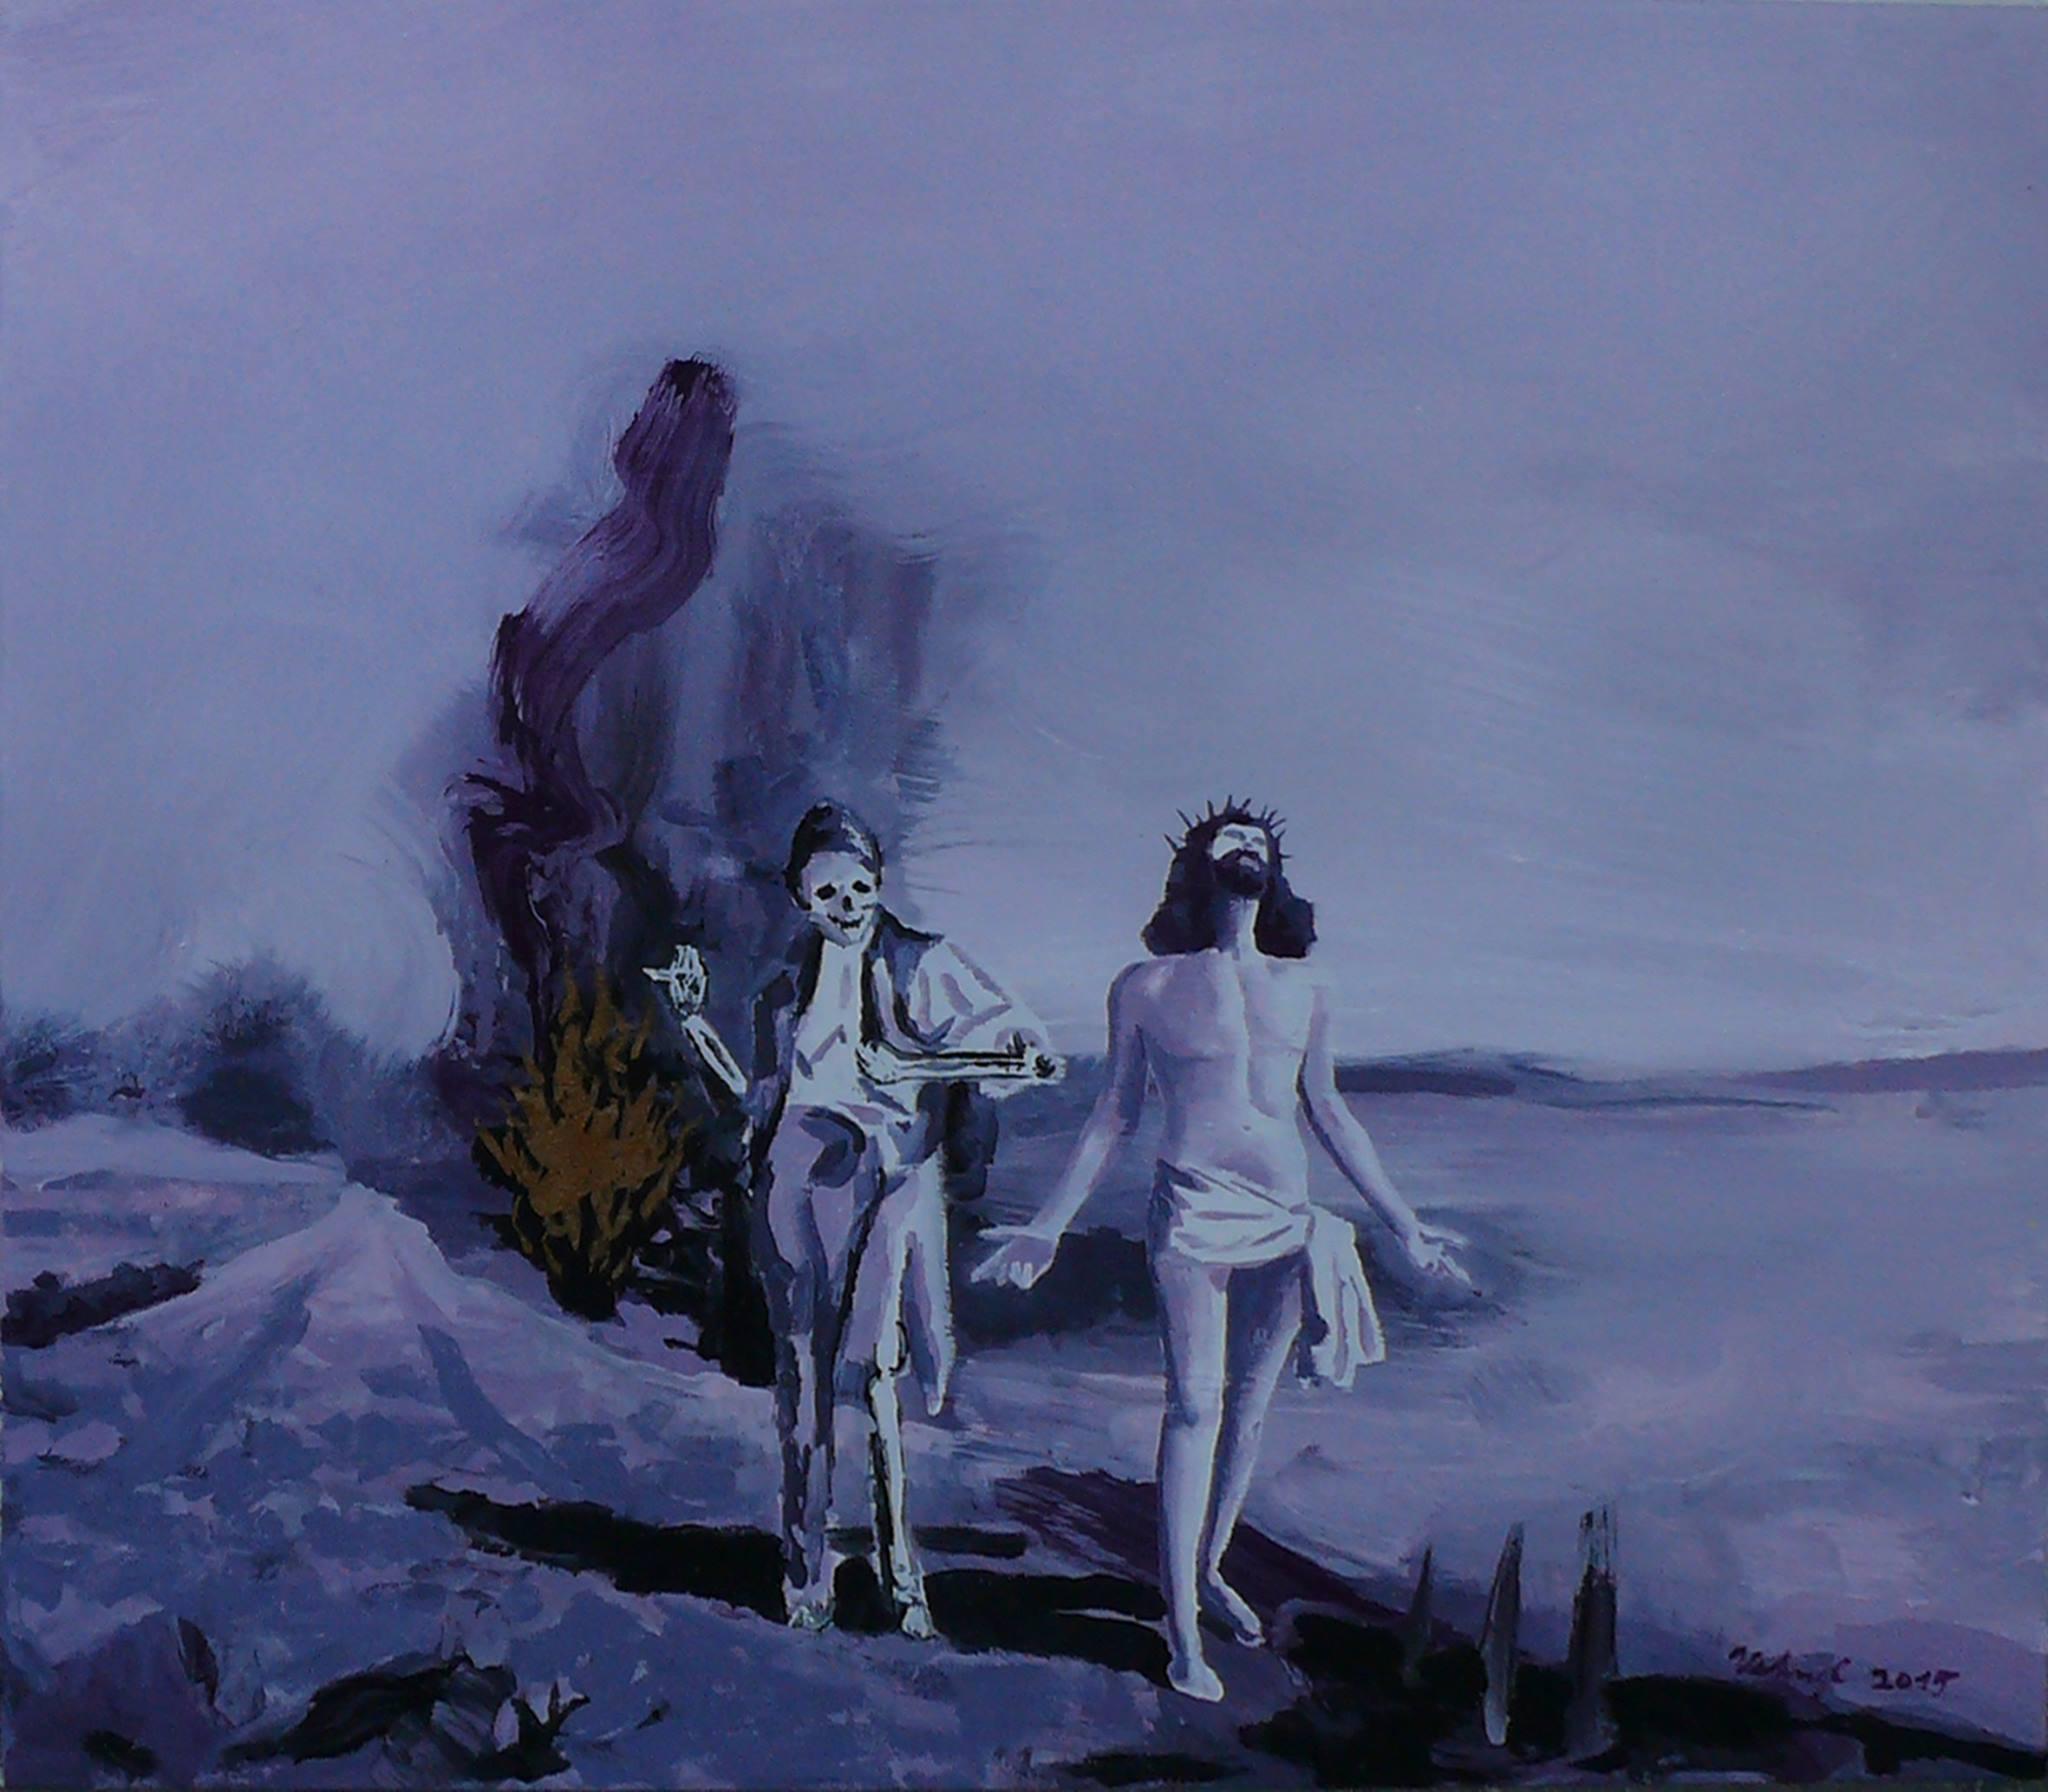 Debata u hořícího keře, 2015, olej a bronz na plátně, 70x80cm